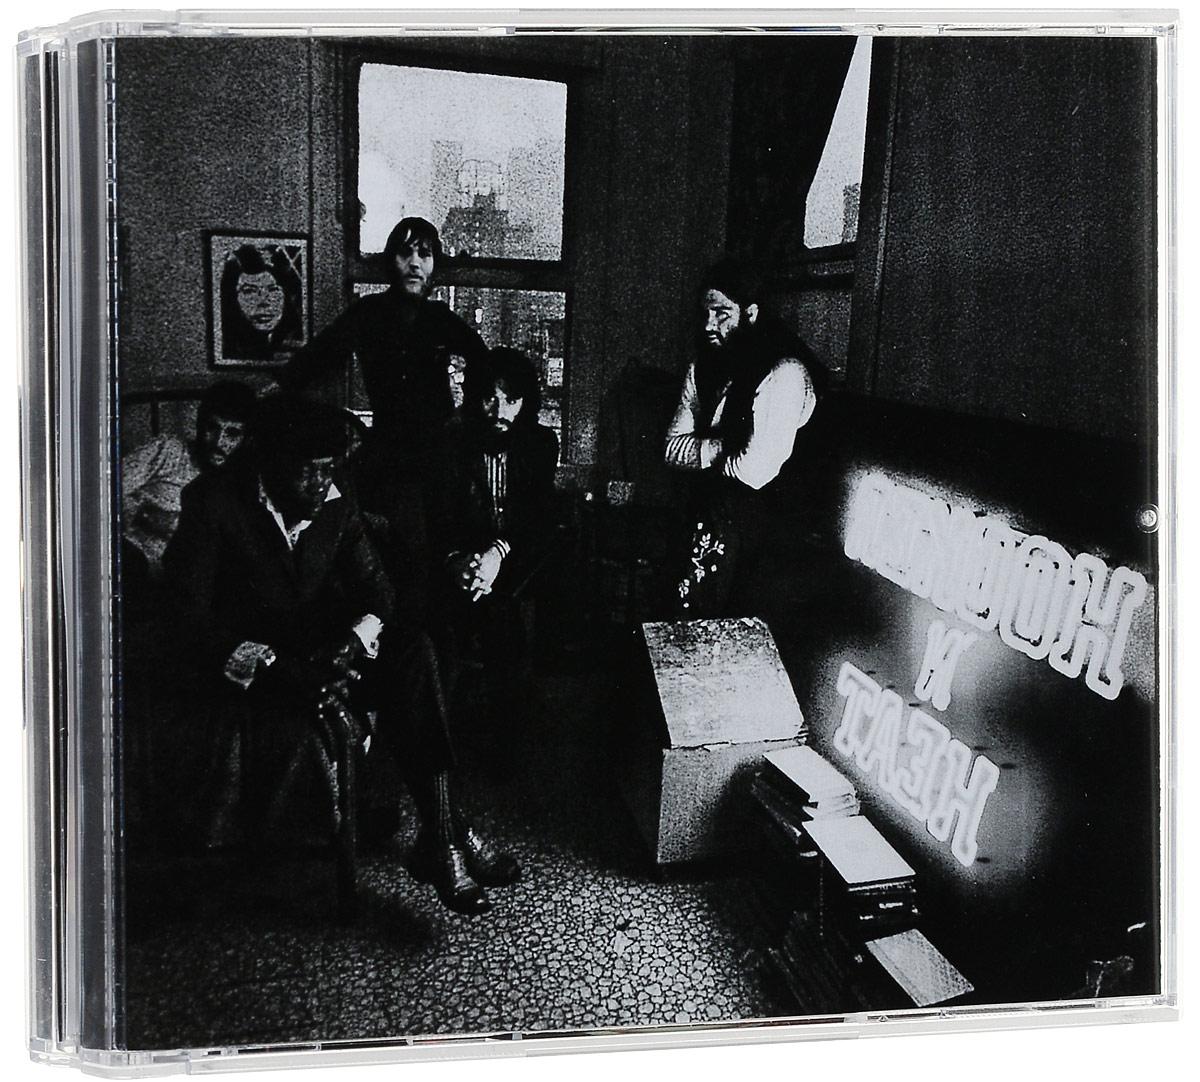 Джон Ли Хукер,Canned Heat John Lee Hooker, Canned Heat. Hooker 'N Heat (2 CD) джон ли хукер john lee hooker blues is the healer 10 cd